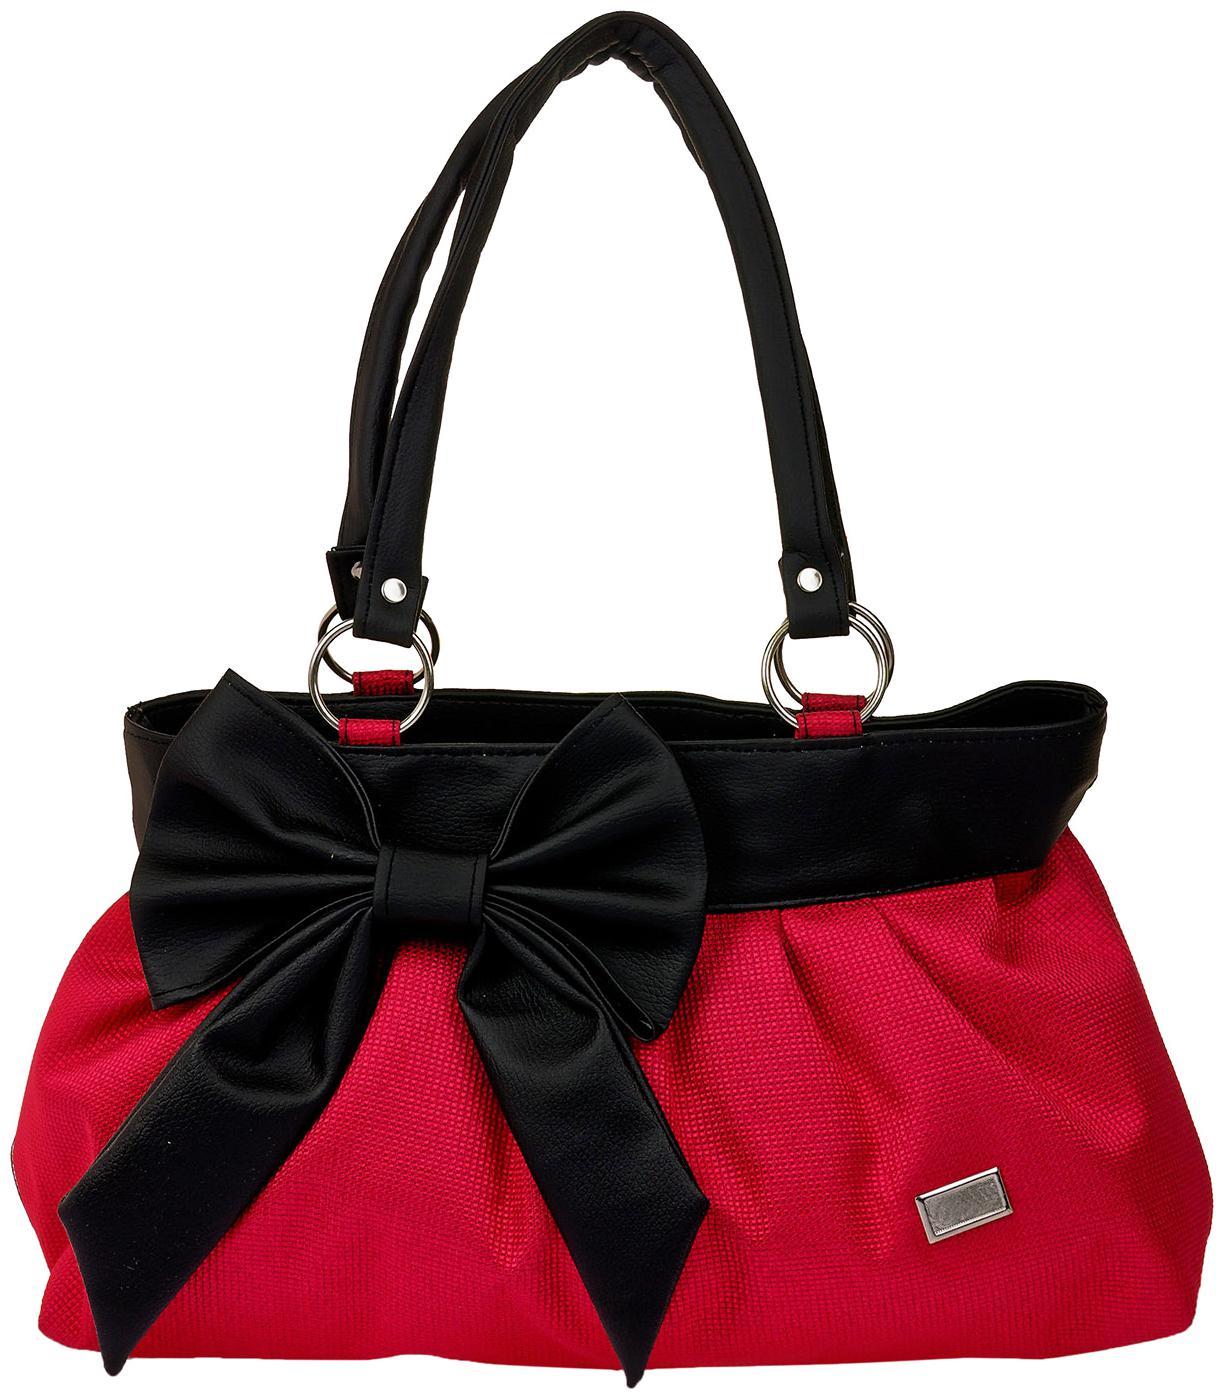 JGSHOPPE Red PU Shoulder Bag   Zurry by JG Shoppe